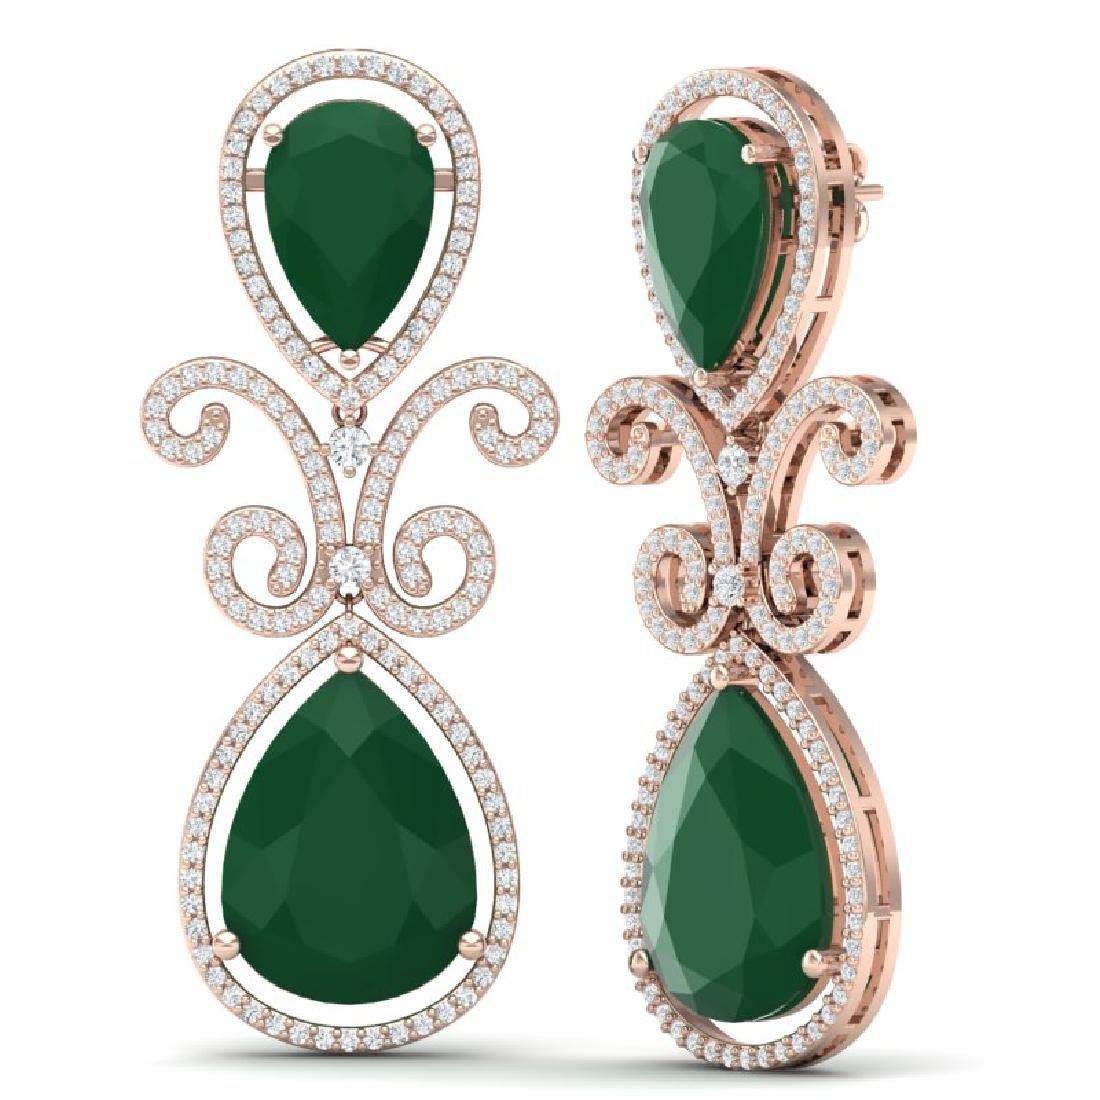 31.6 CTW Royalty Emerald & VS Diamond Earrings 18K Rose - 3